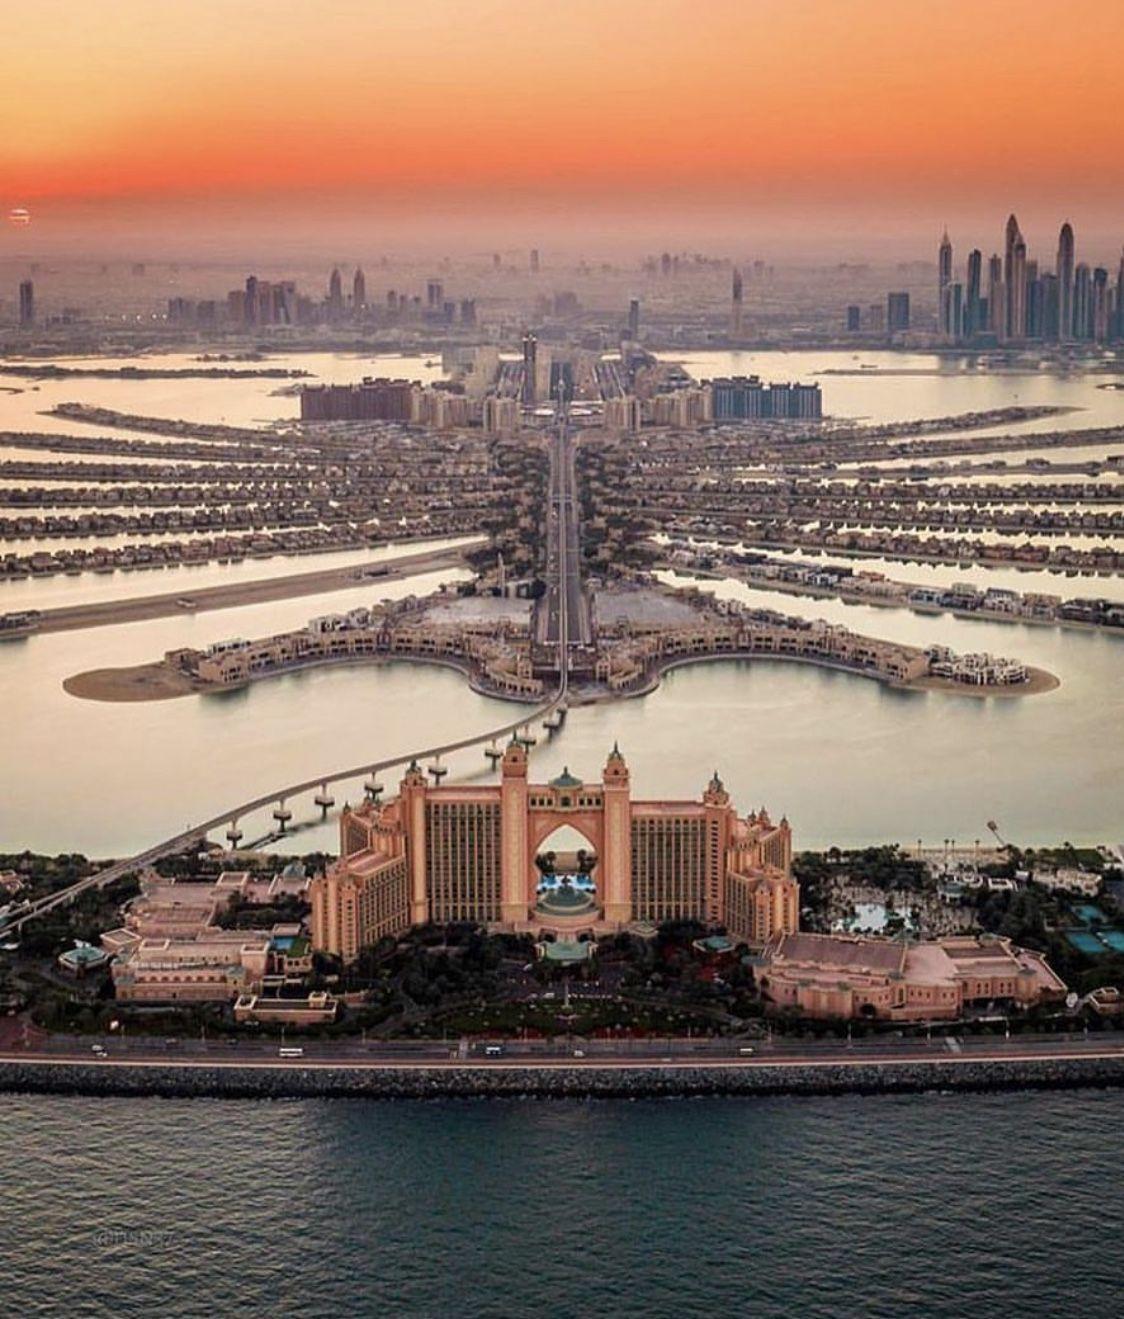 Find Out The Latest Lifestyle News In Dubai Via Shanabergsma Com Dubai Travel Dubai Dubai City